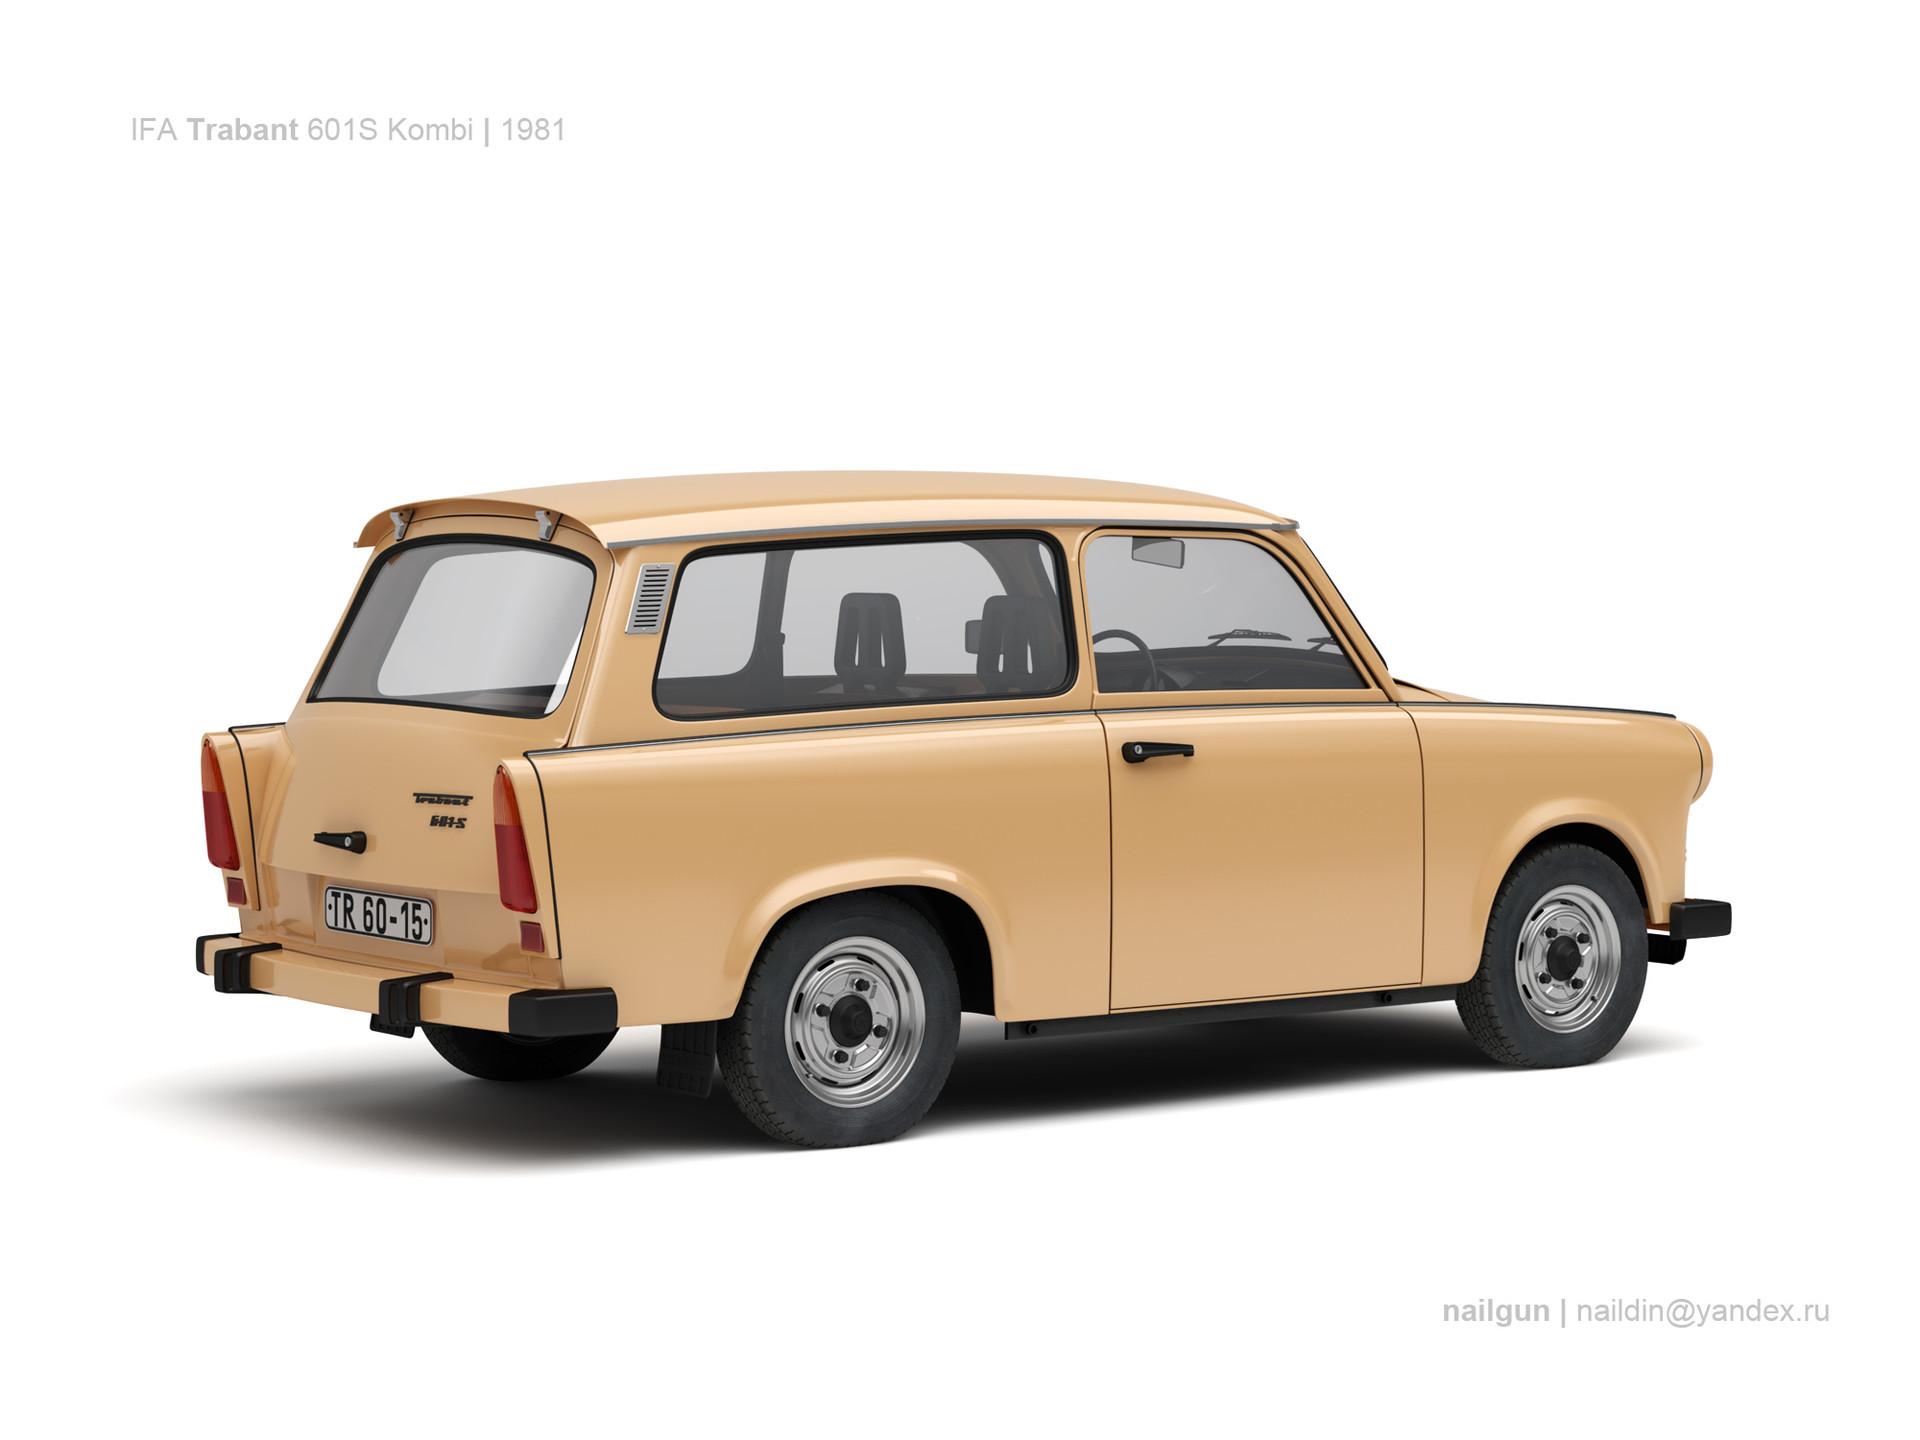 Nail khusnutdinov sw trabant 601s kombi 1